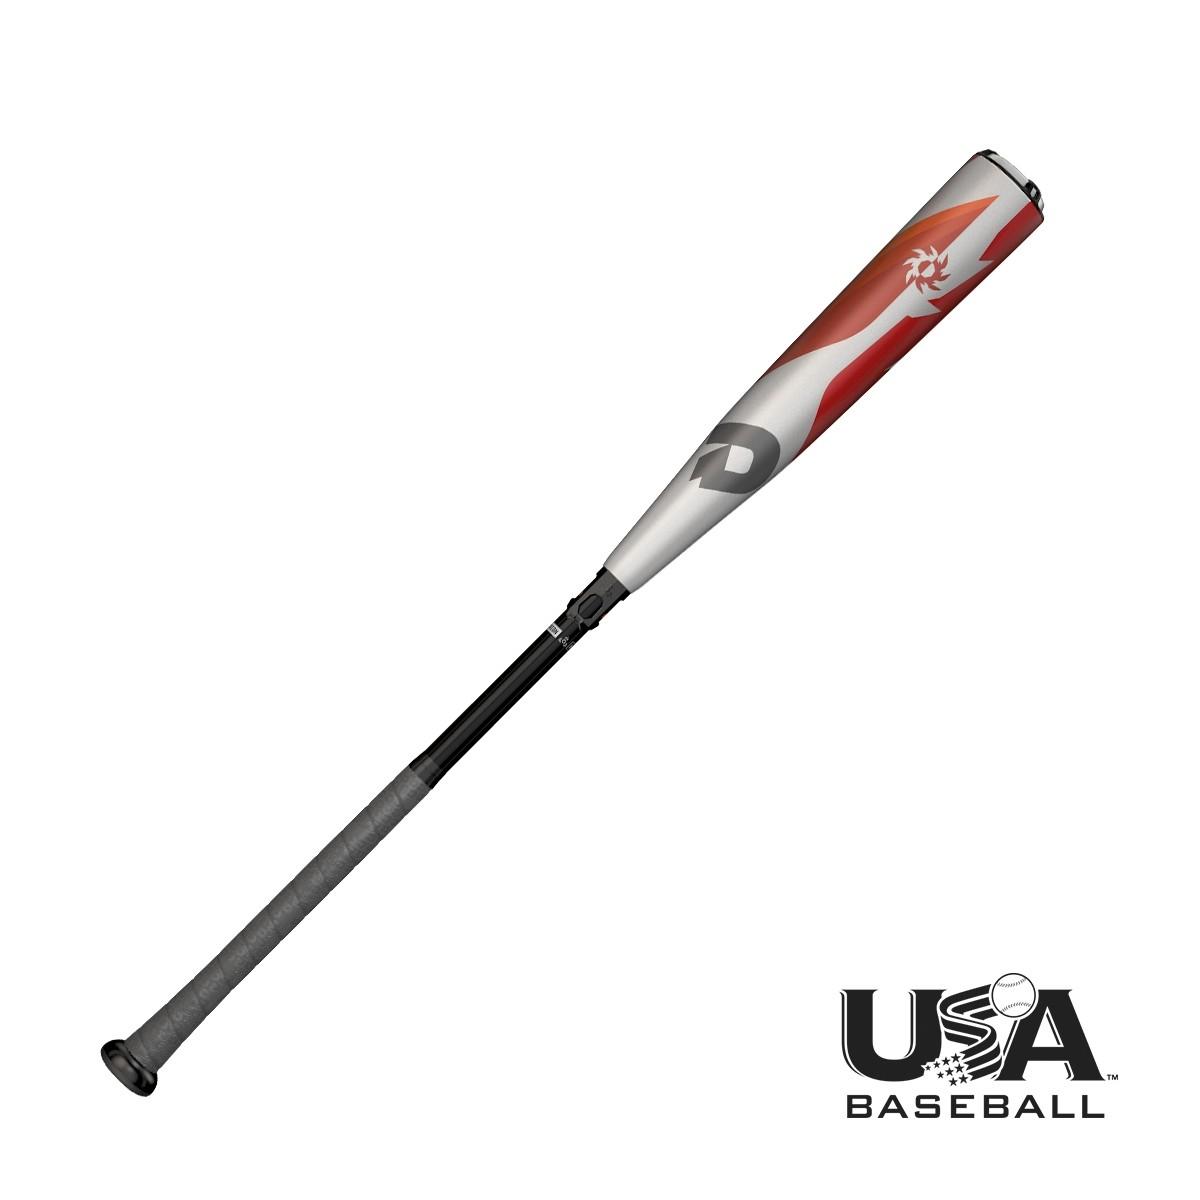 demarini-voodoo-10-2018-usa-balanced-2-5-8-baseball-bat-29-inch-19-oz WTDXUD21929-18  887768610630 Following along with the new USA baseball standards the newest line